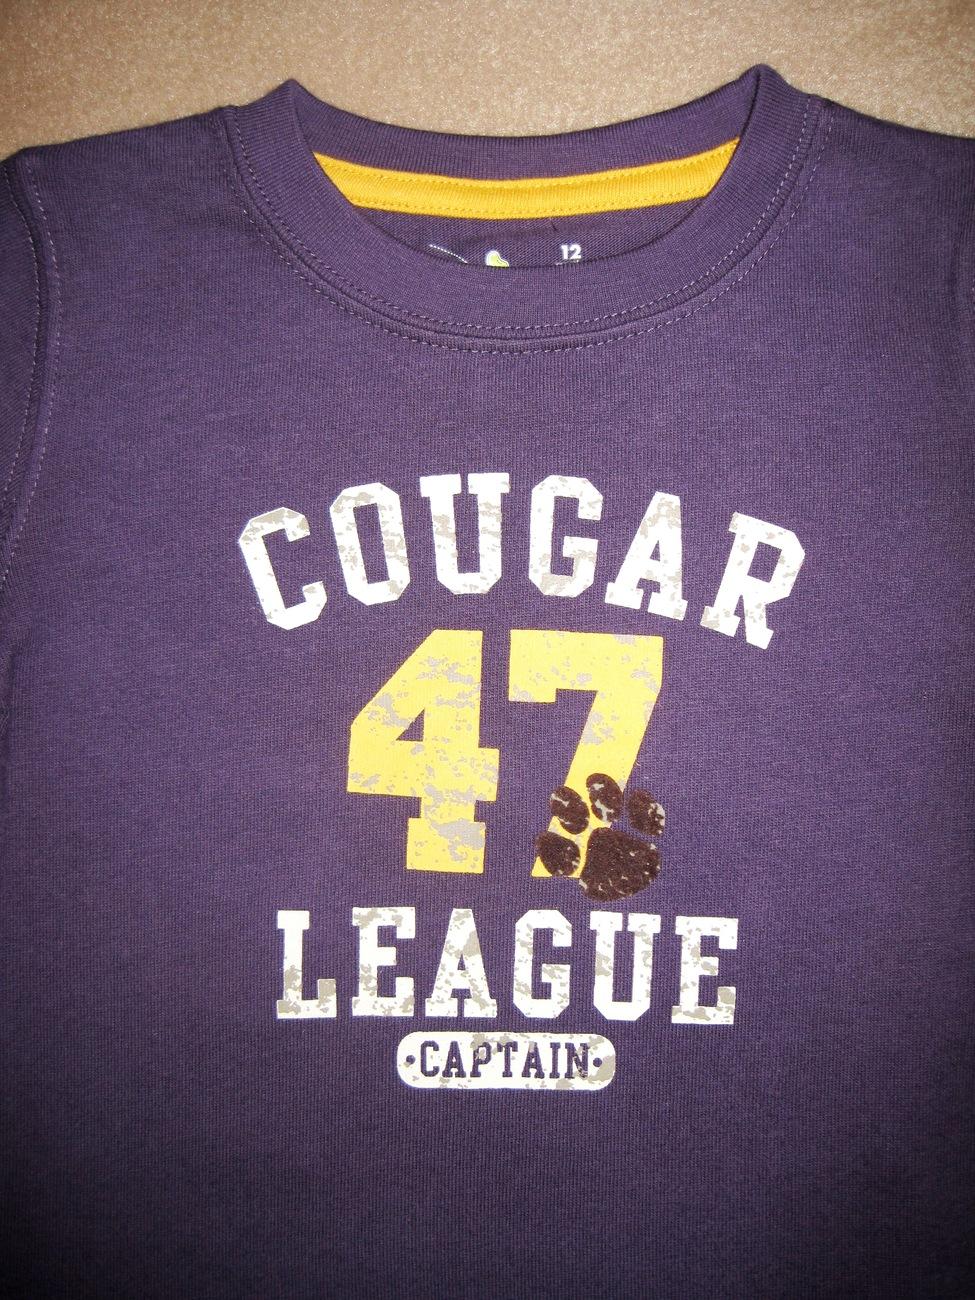 BOYS 12 MONTHS - Jumping Beans - Cougar League #47 Captain KNIT SHIRT